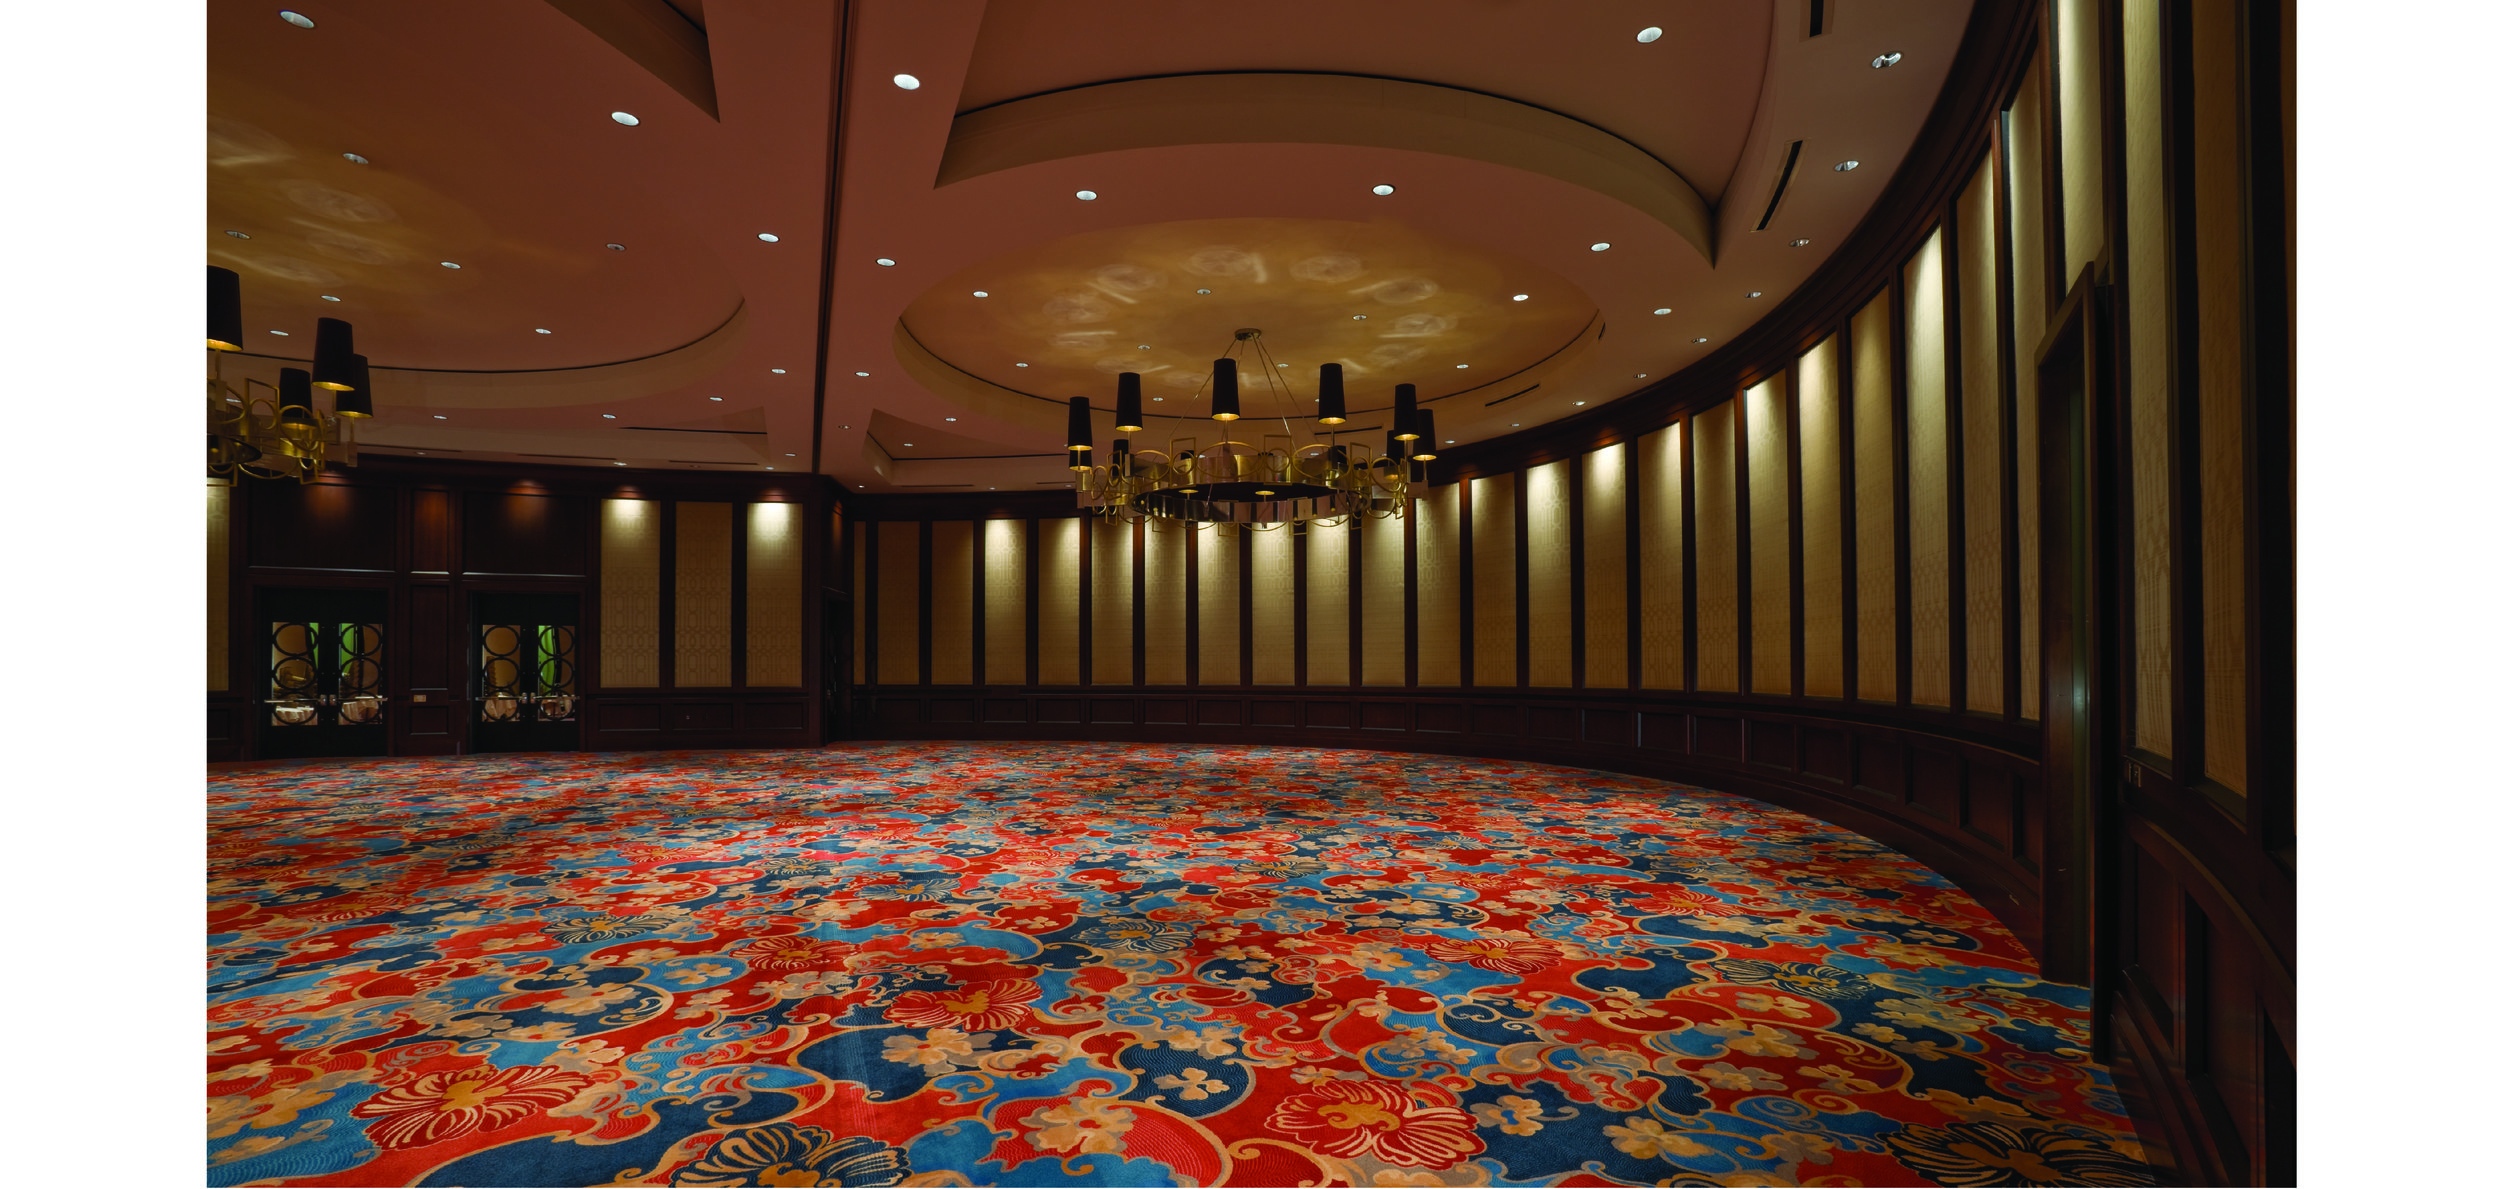 Stemmons Ballroom